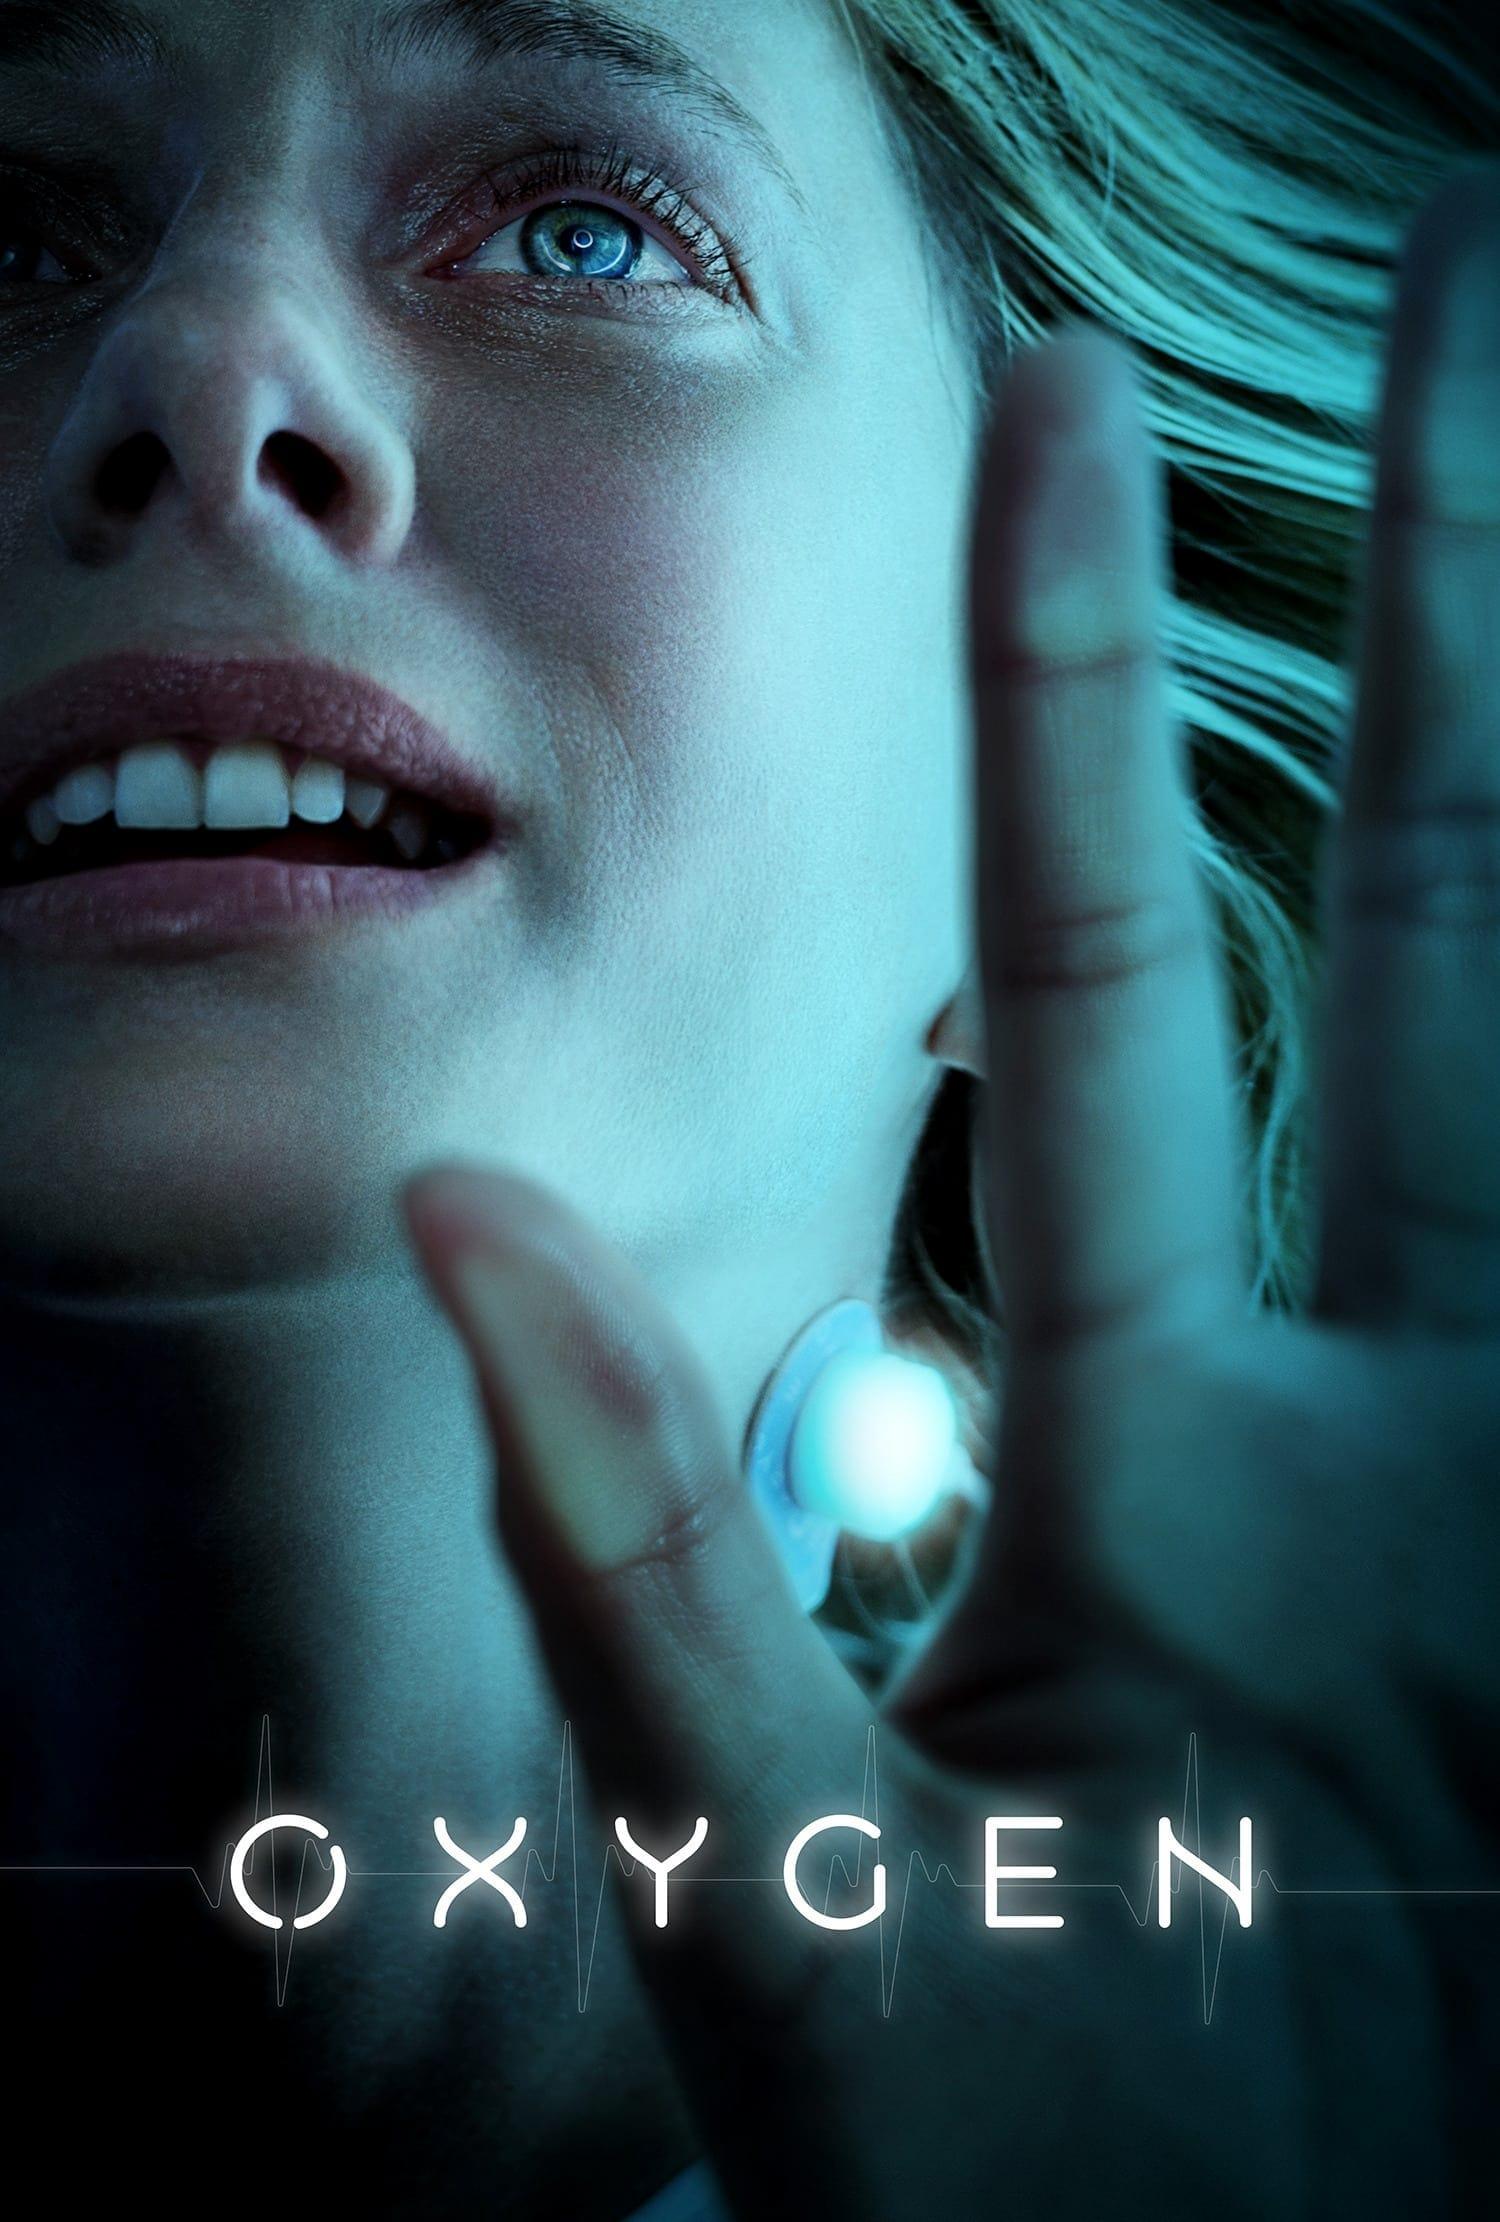 Oxygen (2021) Movie. Where To Watch Streaming Online & Plot